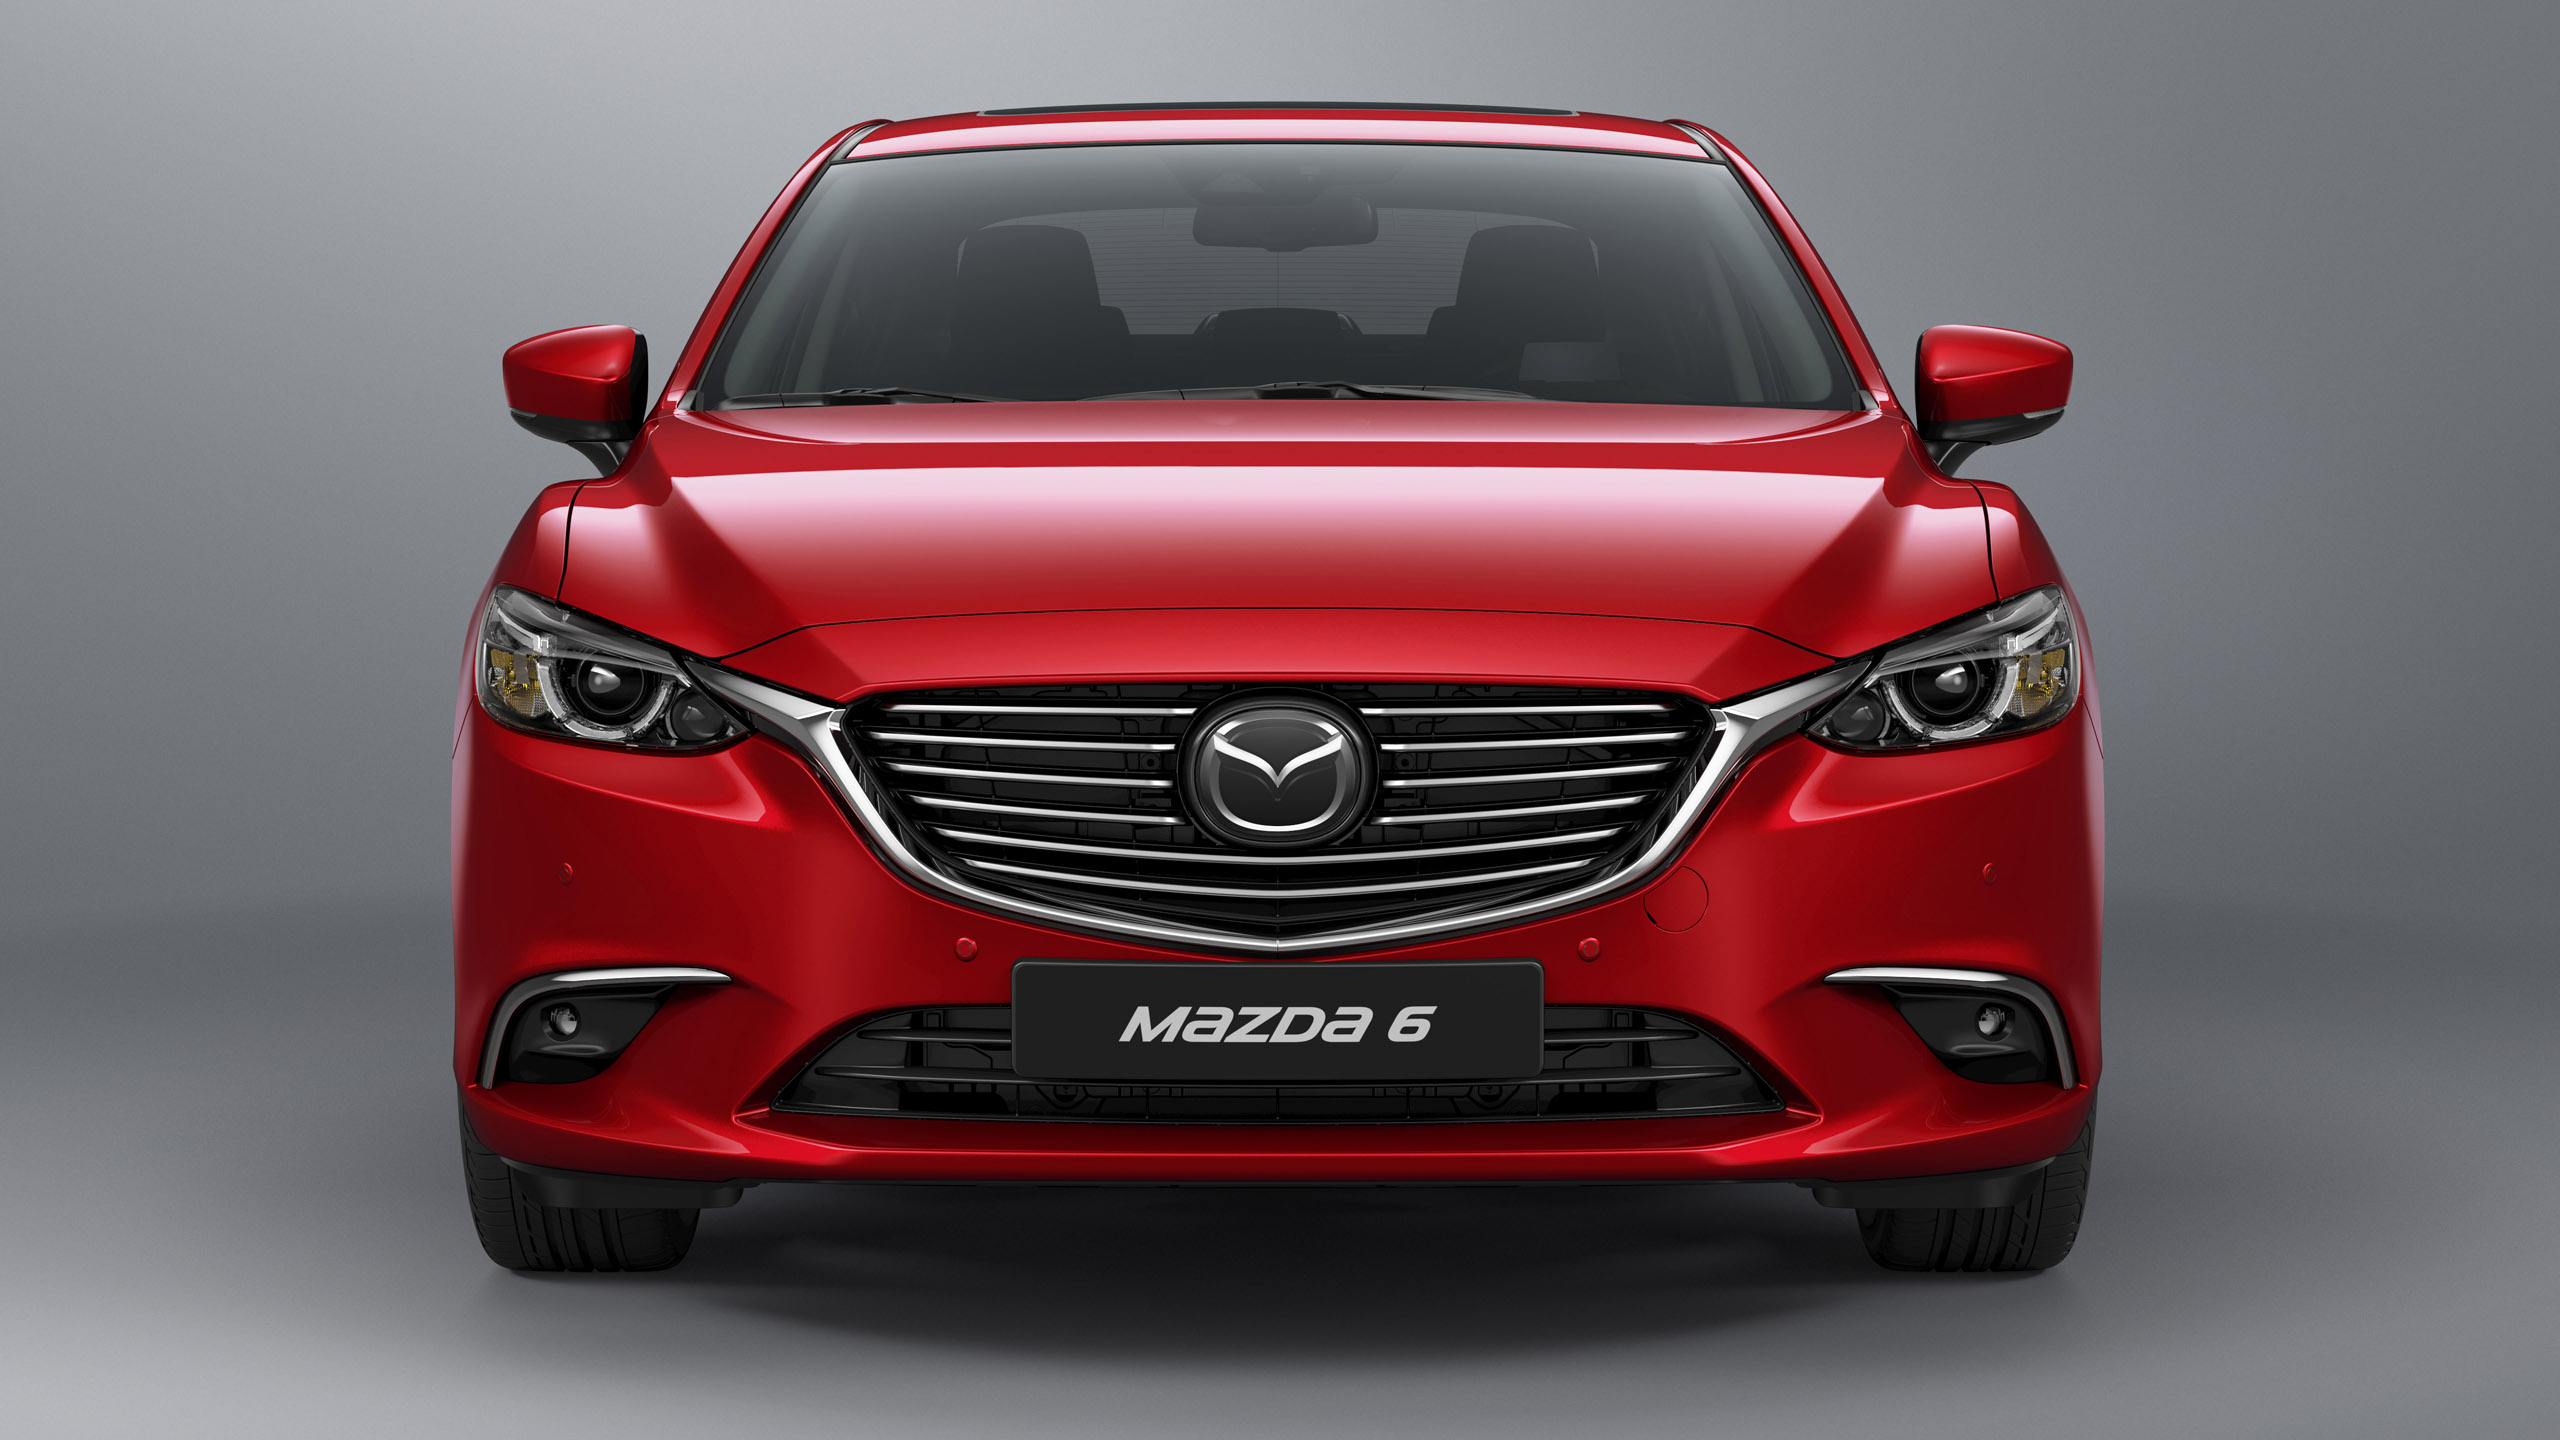 Download wallpapers Mazda6, 2018 cars, motion blur, UK-spec, Mazda ... | 1440x2560